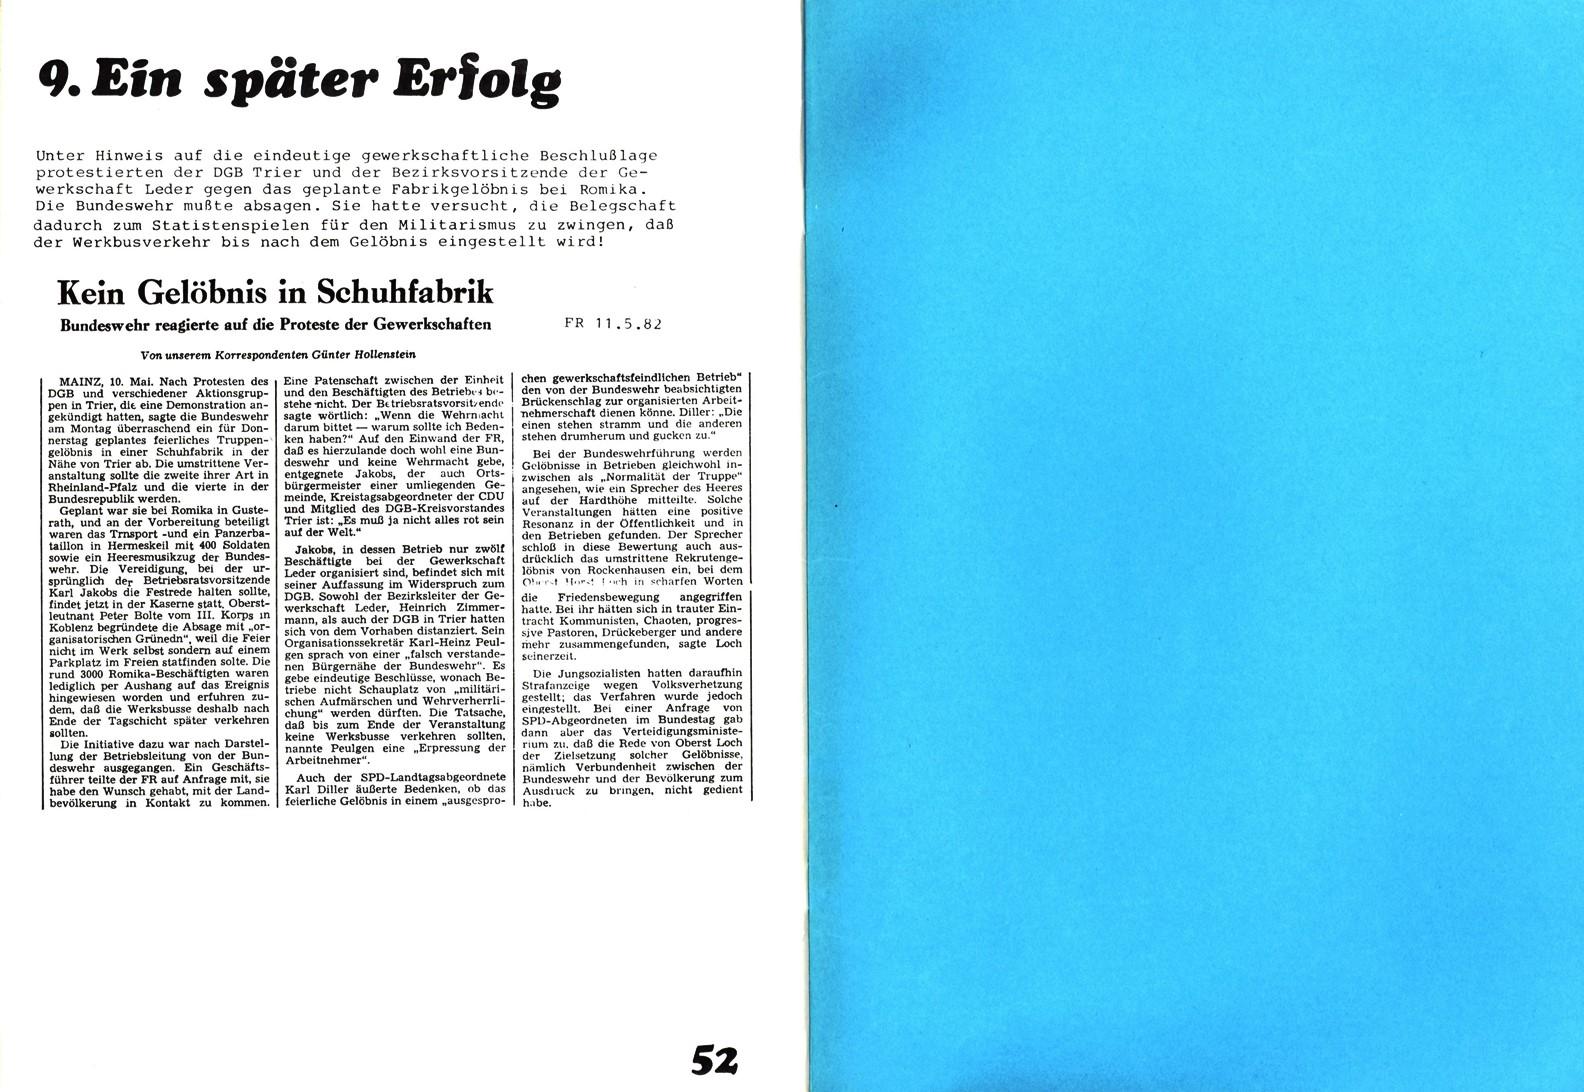 Mainz_AB_1982_Doku_Rockenhausen_28